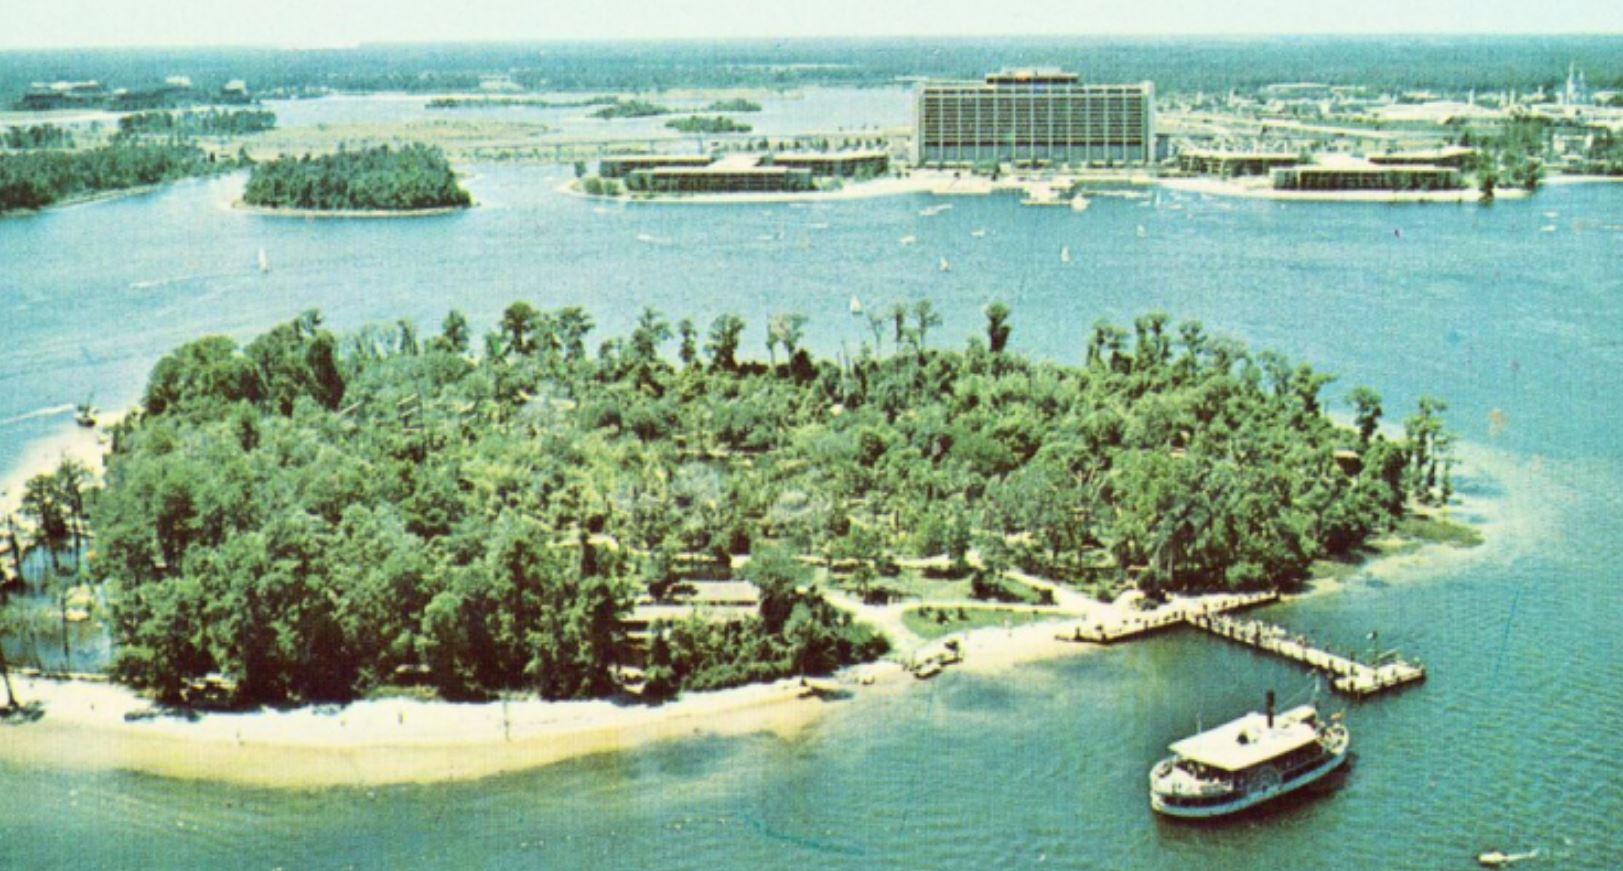 isola abbandonata disney